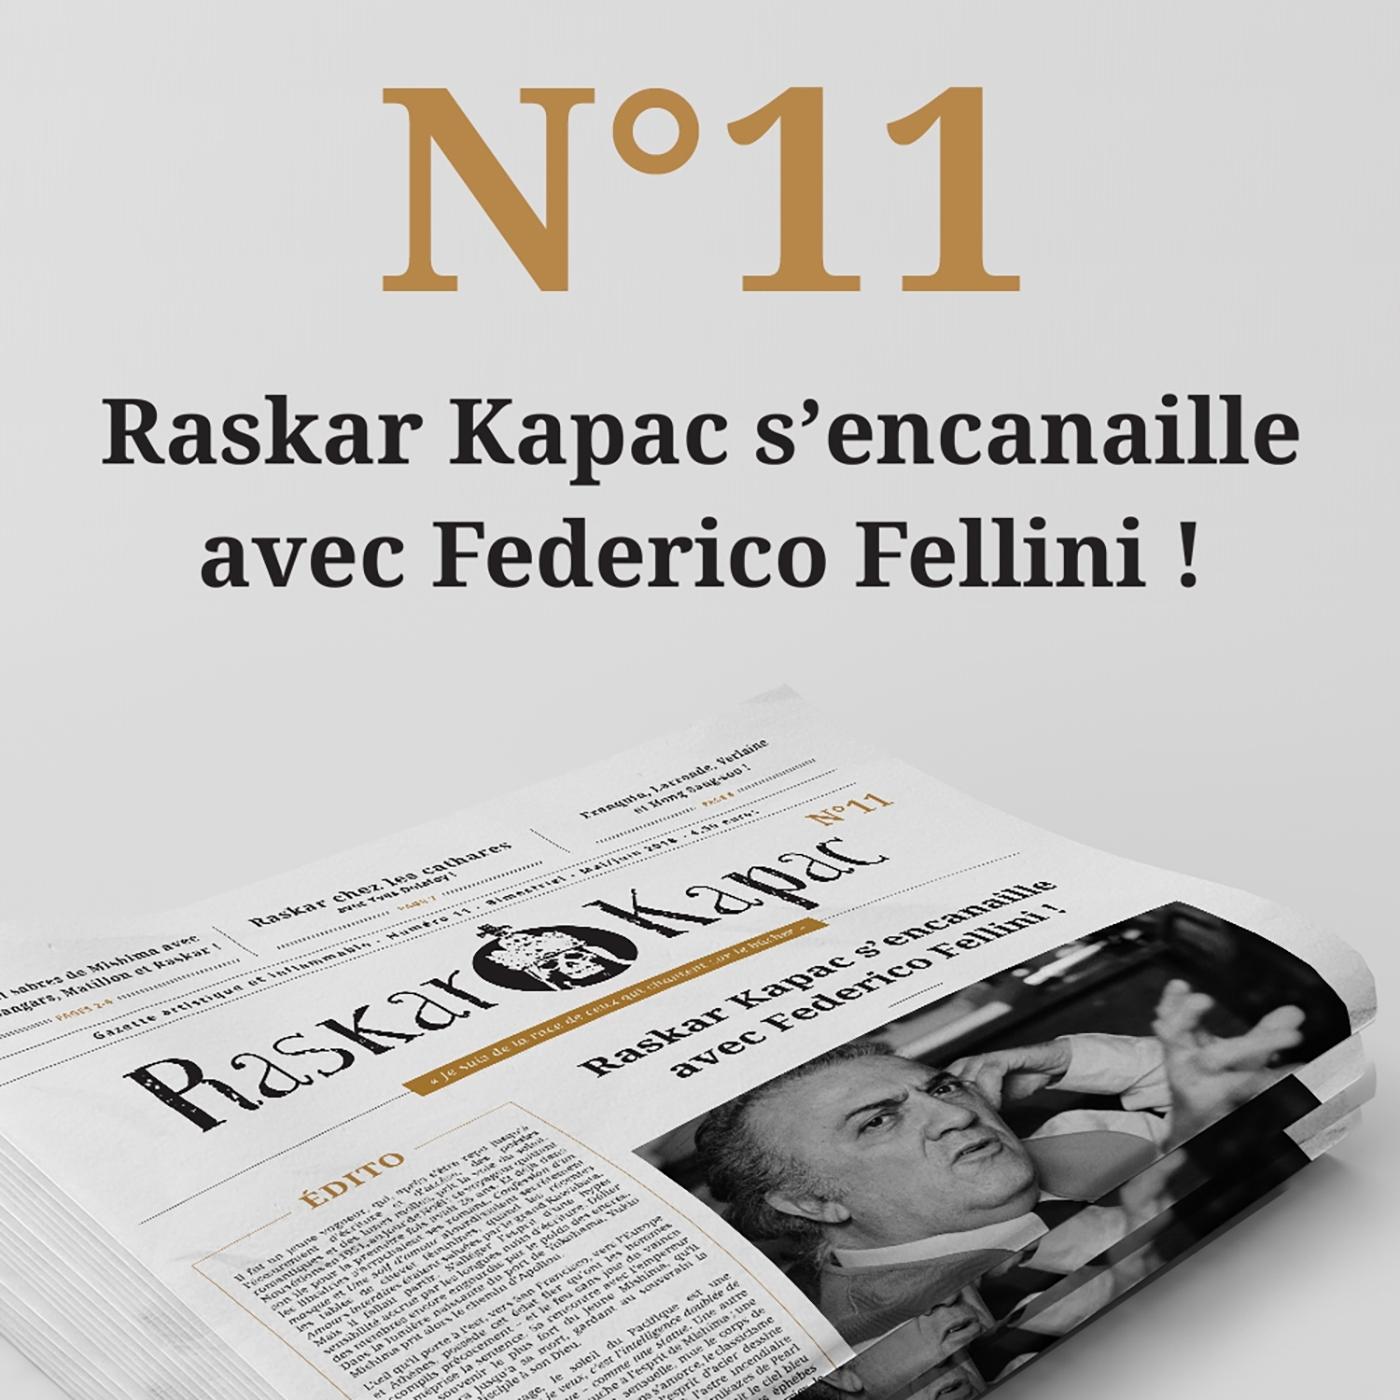 RASKAR KAPAC N  11 - GAZETTE ARTISTIQUE ET INFLAMMABLE